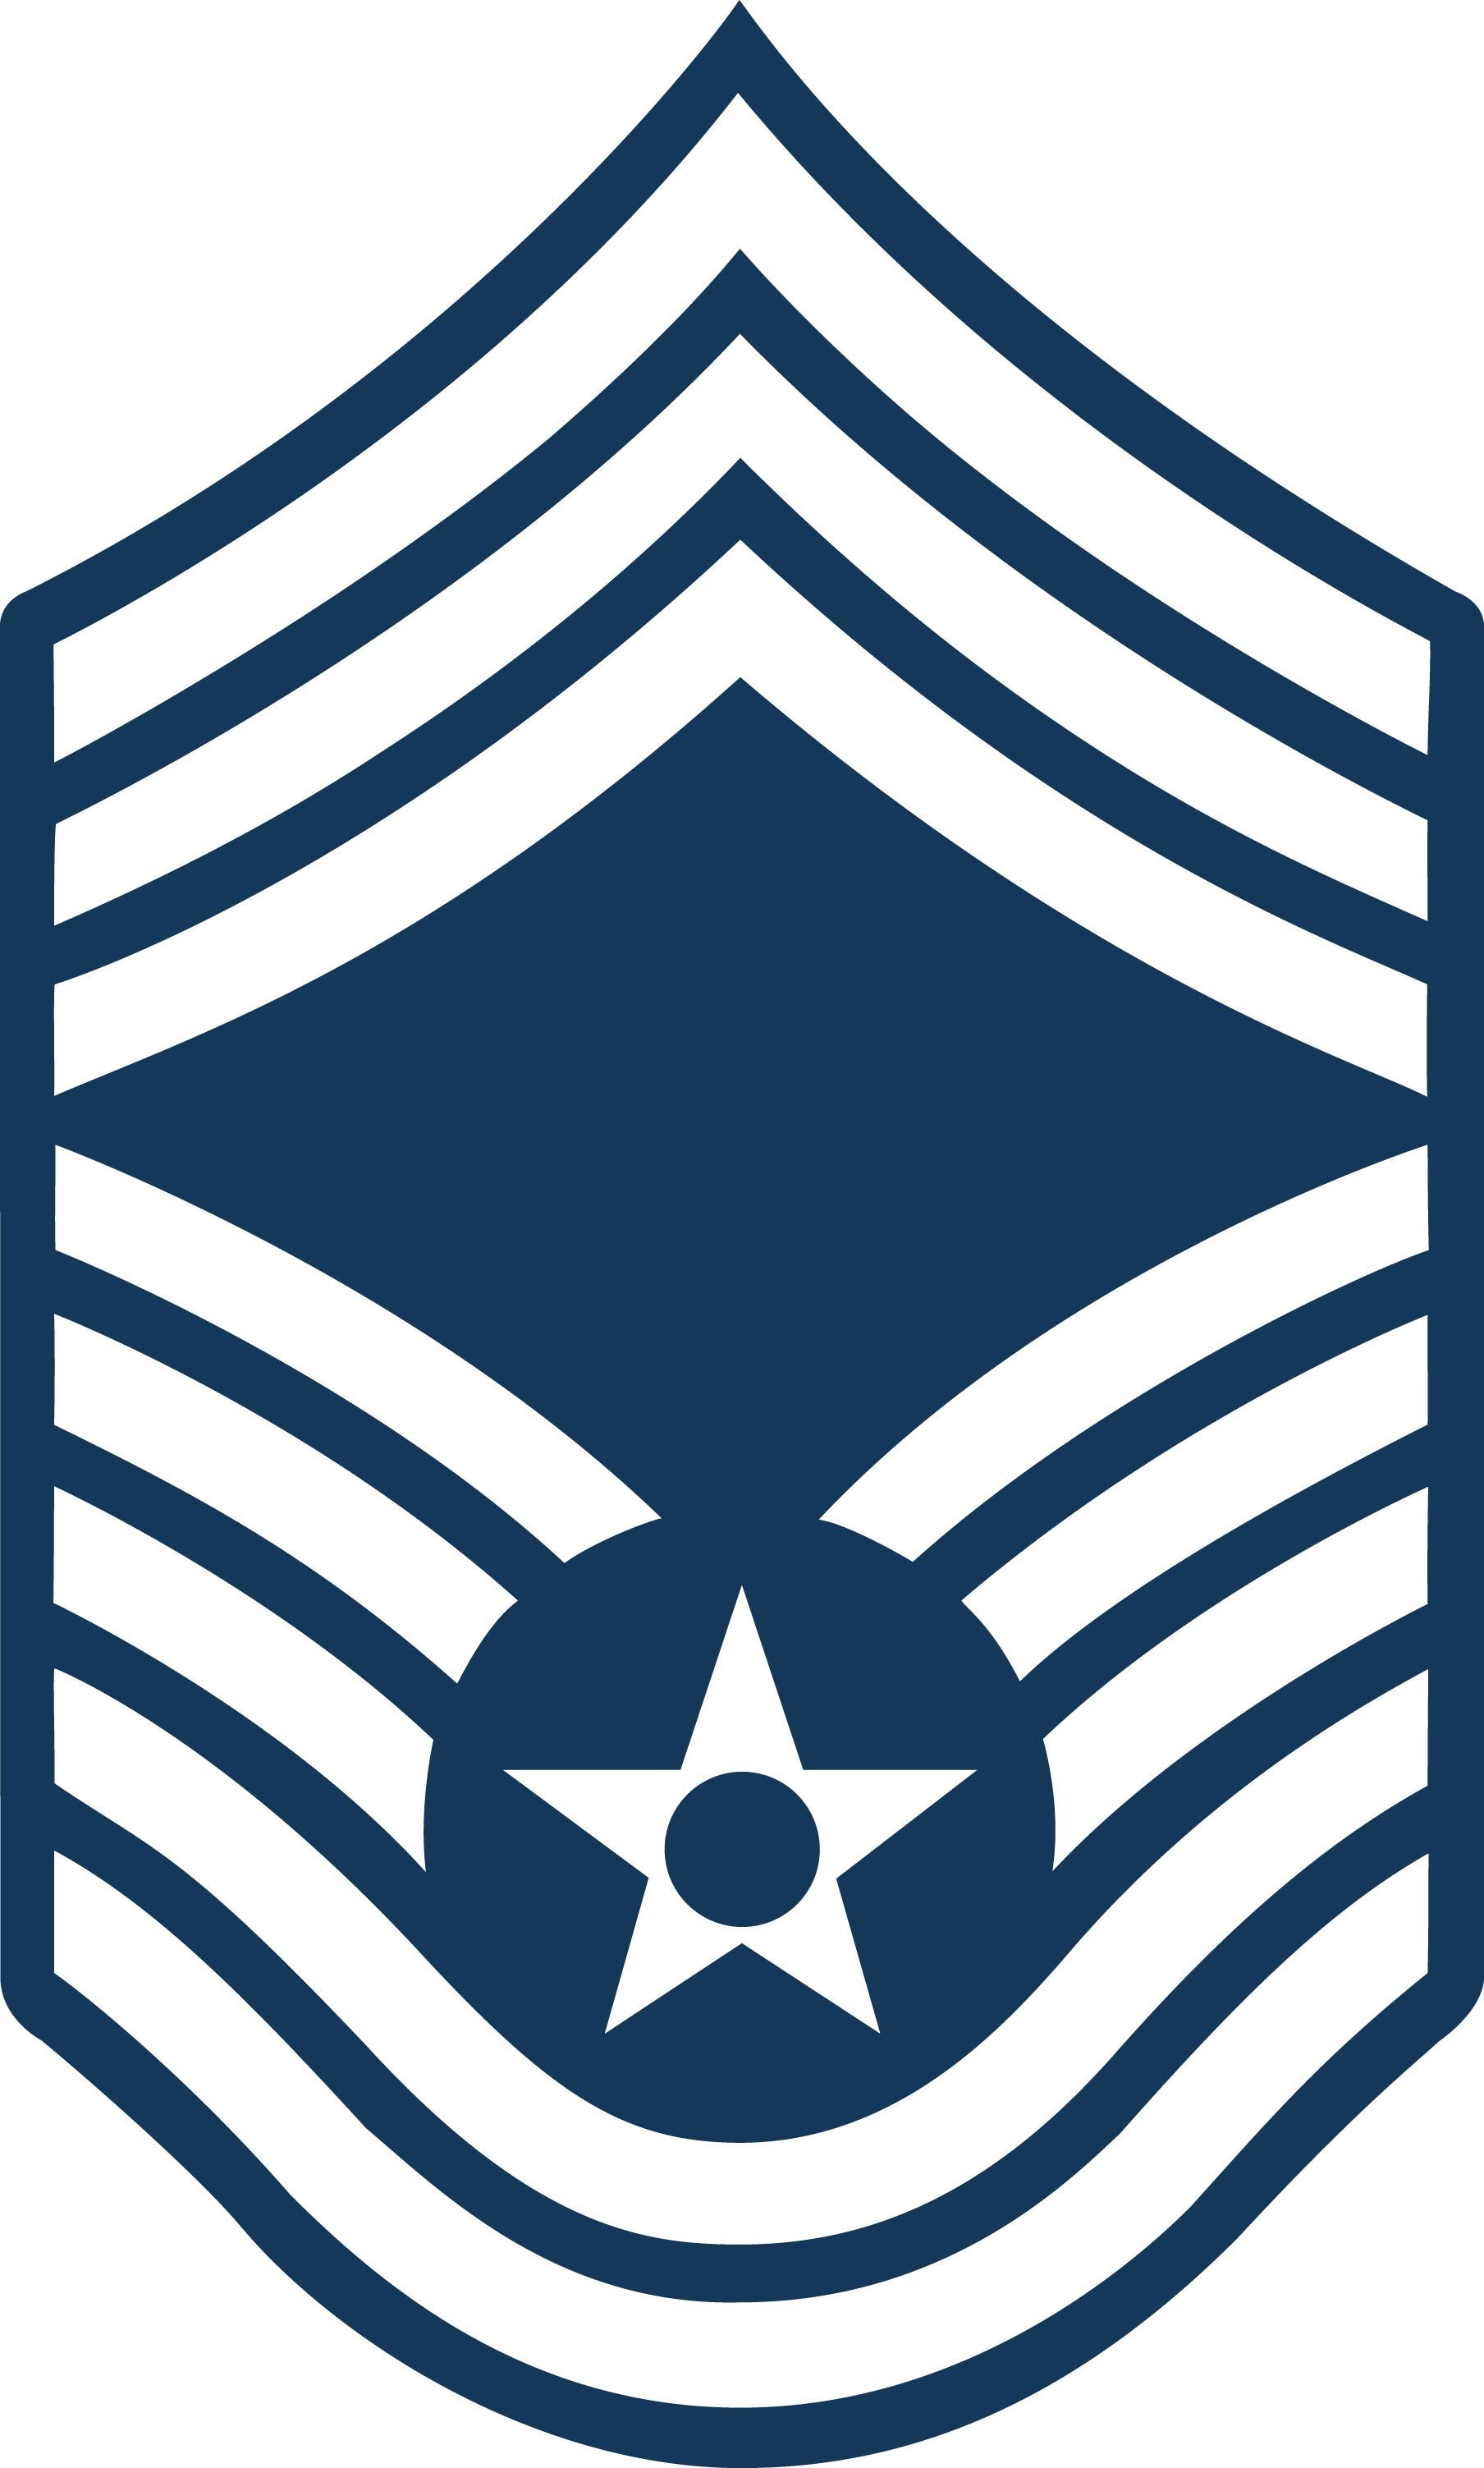 Chief Master Sergeant CMSgt stripes.